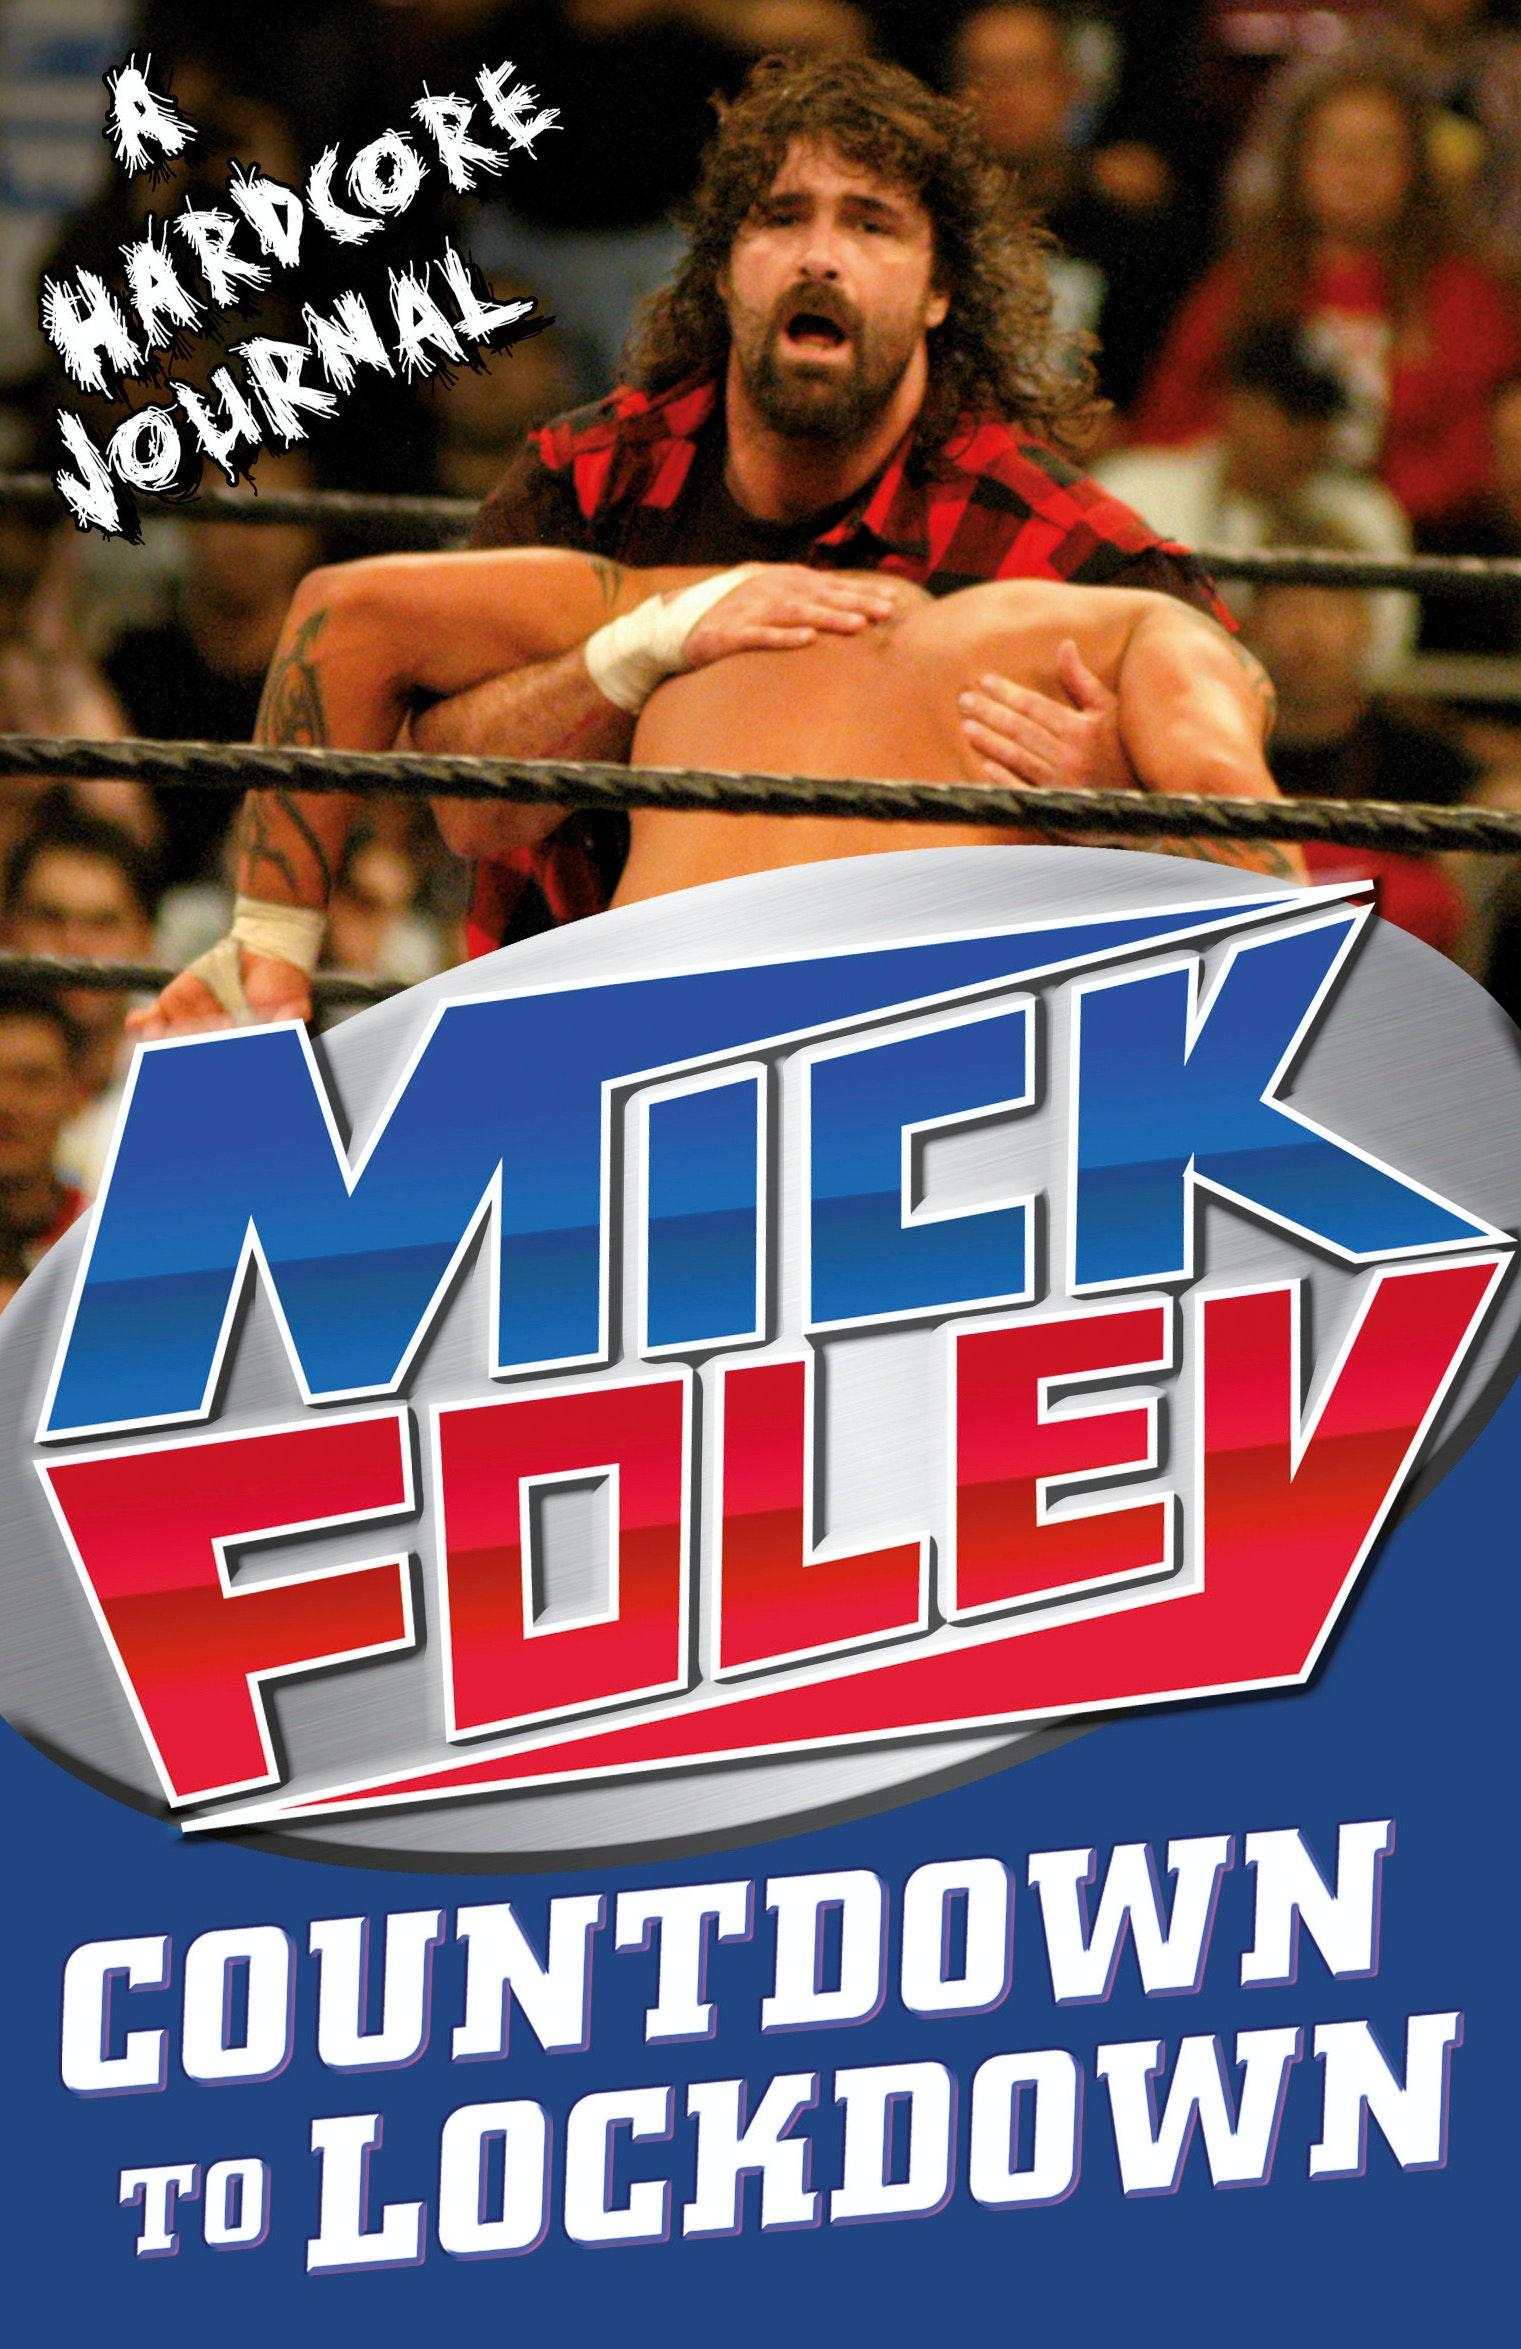 Mick Foley Book